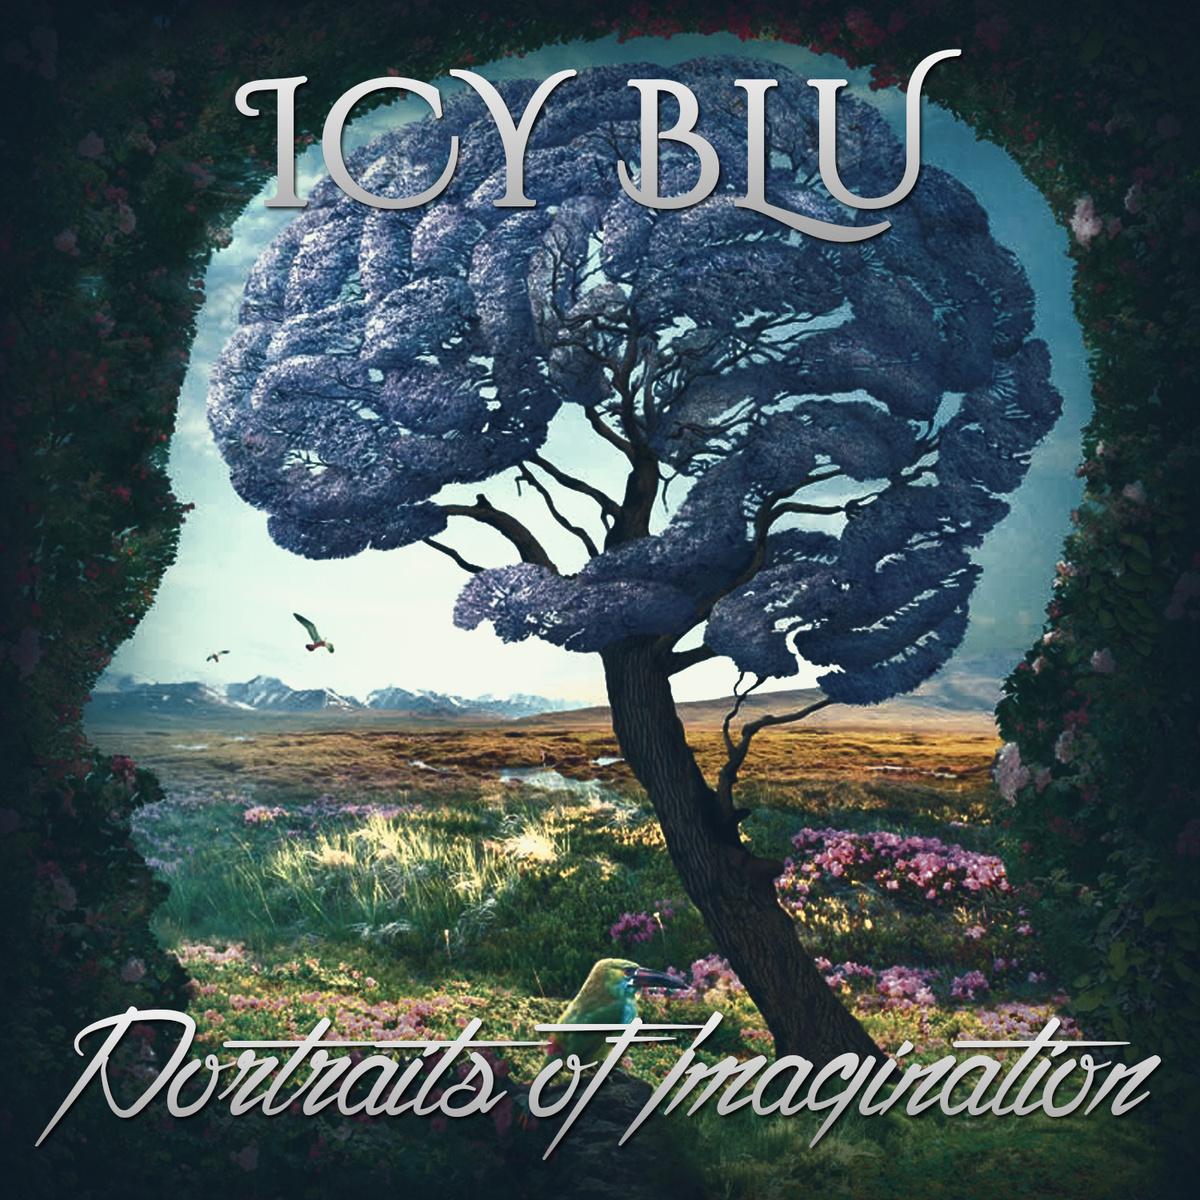 Icy Blu –Portraits of Imagination